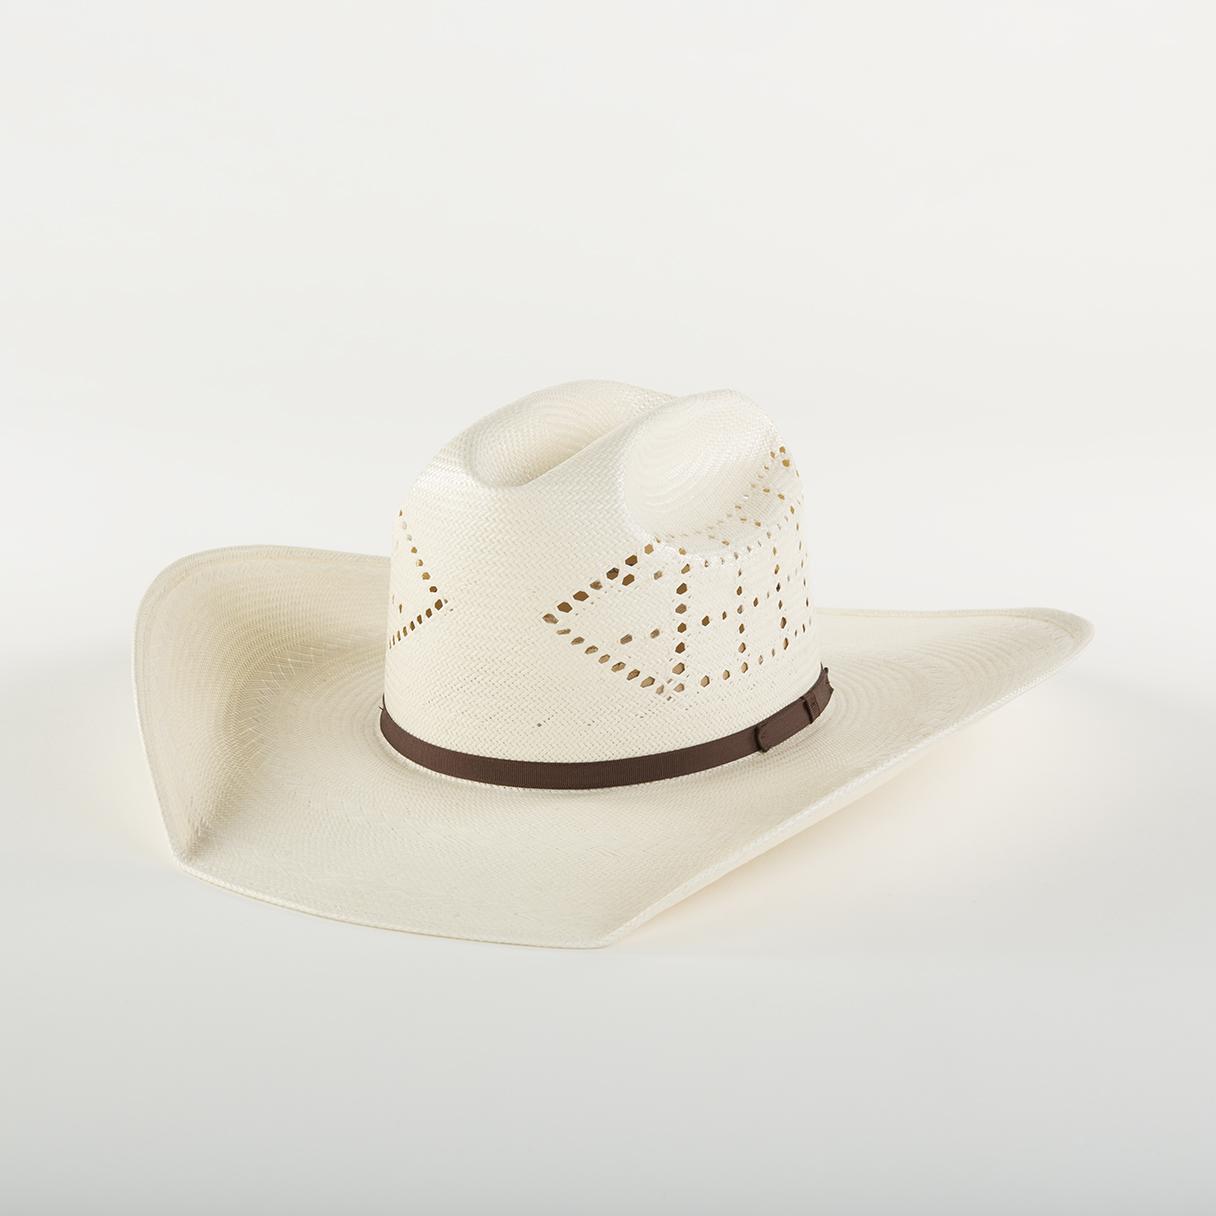 Hex Ivory - Ivory Shantung, brim width 3 - 5 inch.